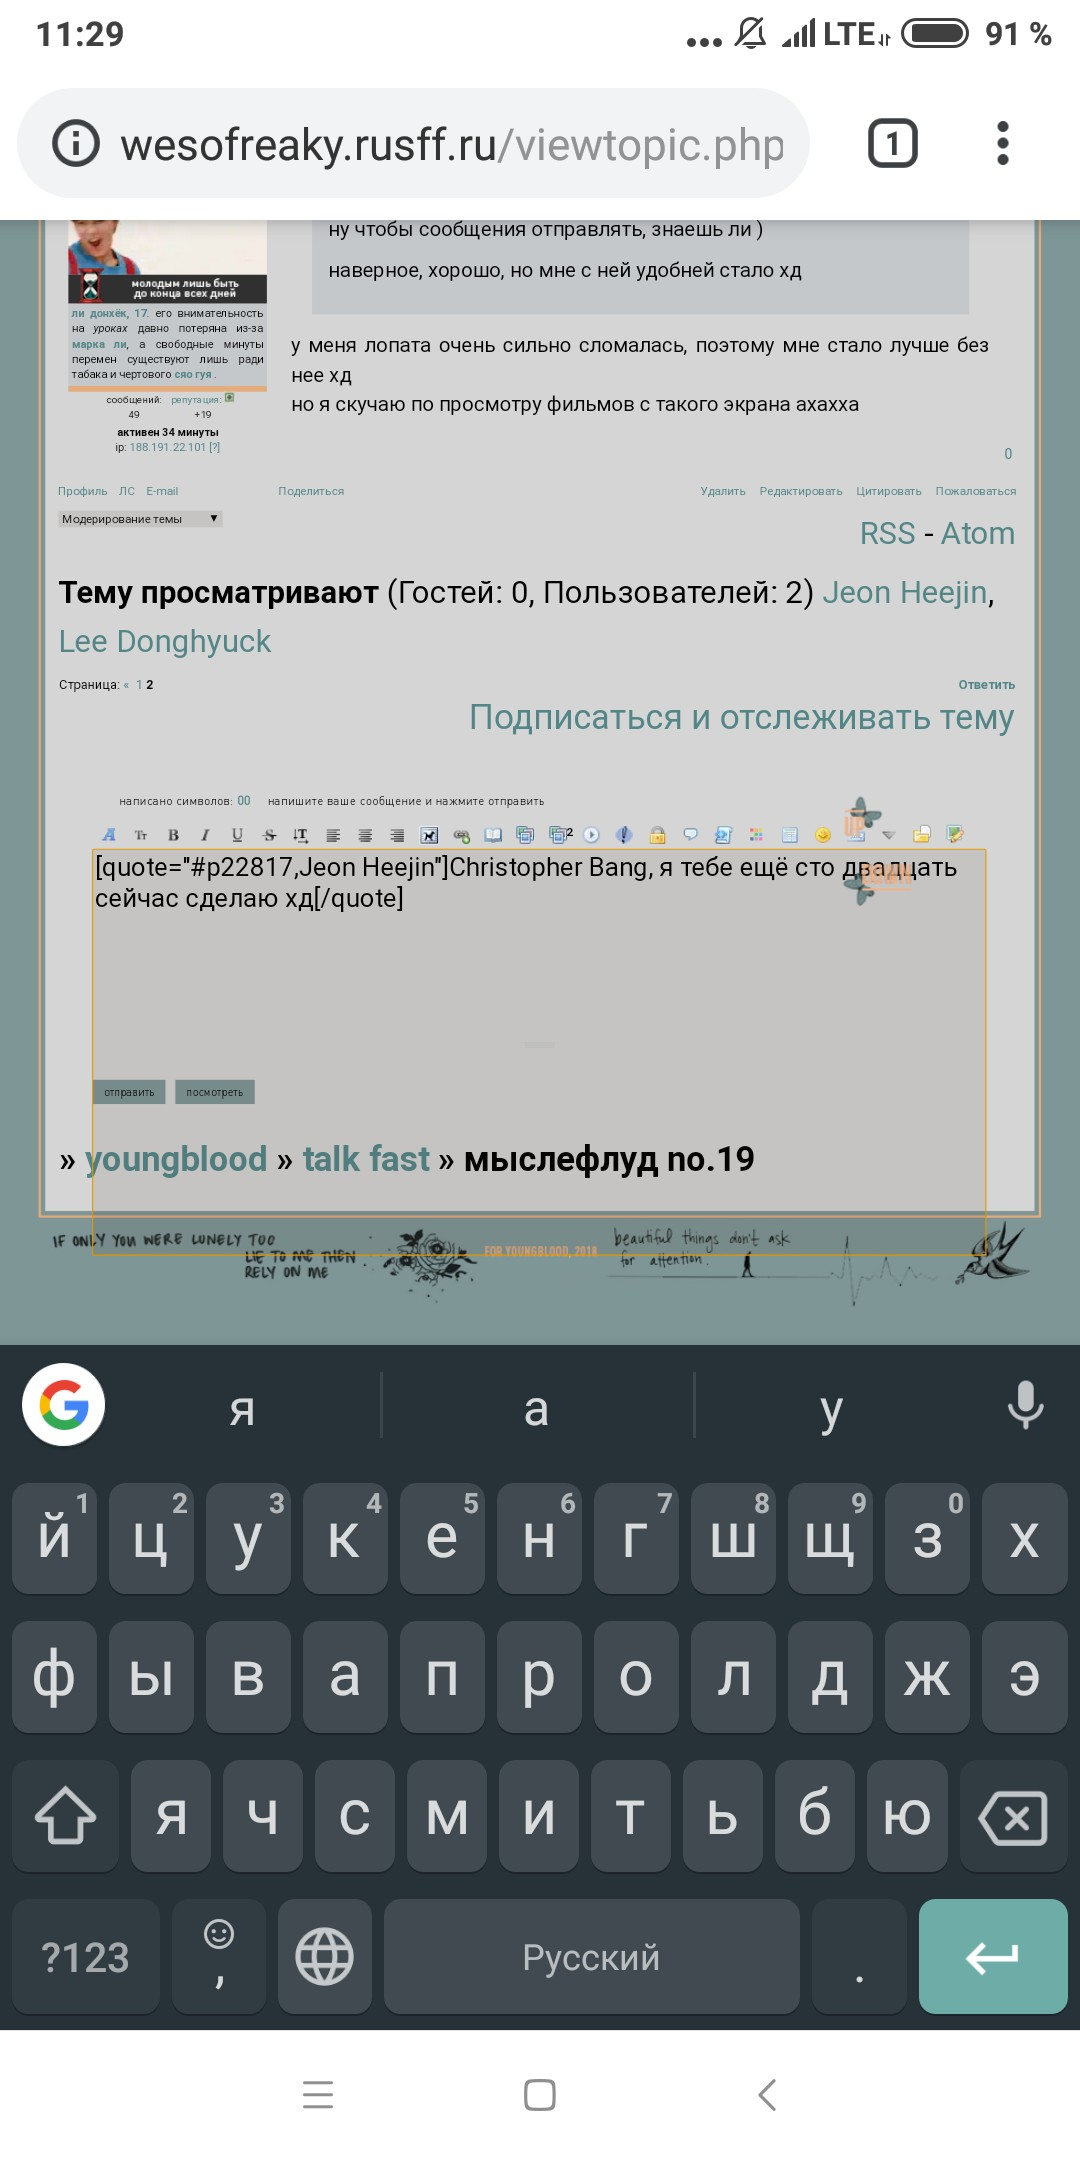 https://pp.userapi.com/c851332/v851332987/60855/zhzMRTxcqss.jpg